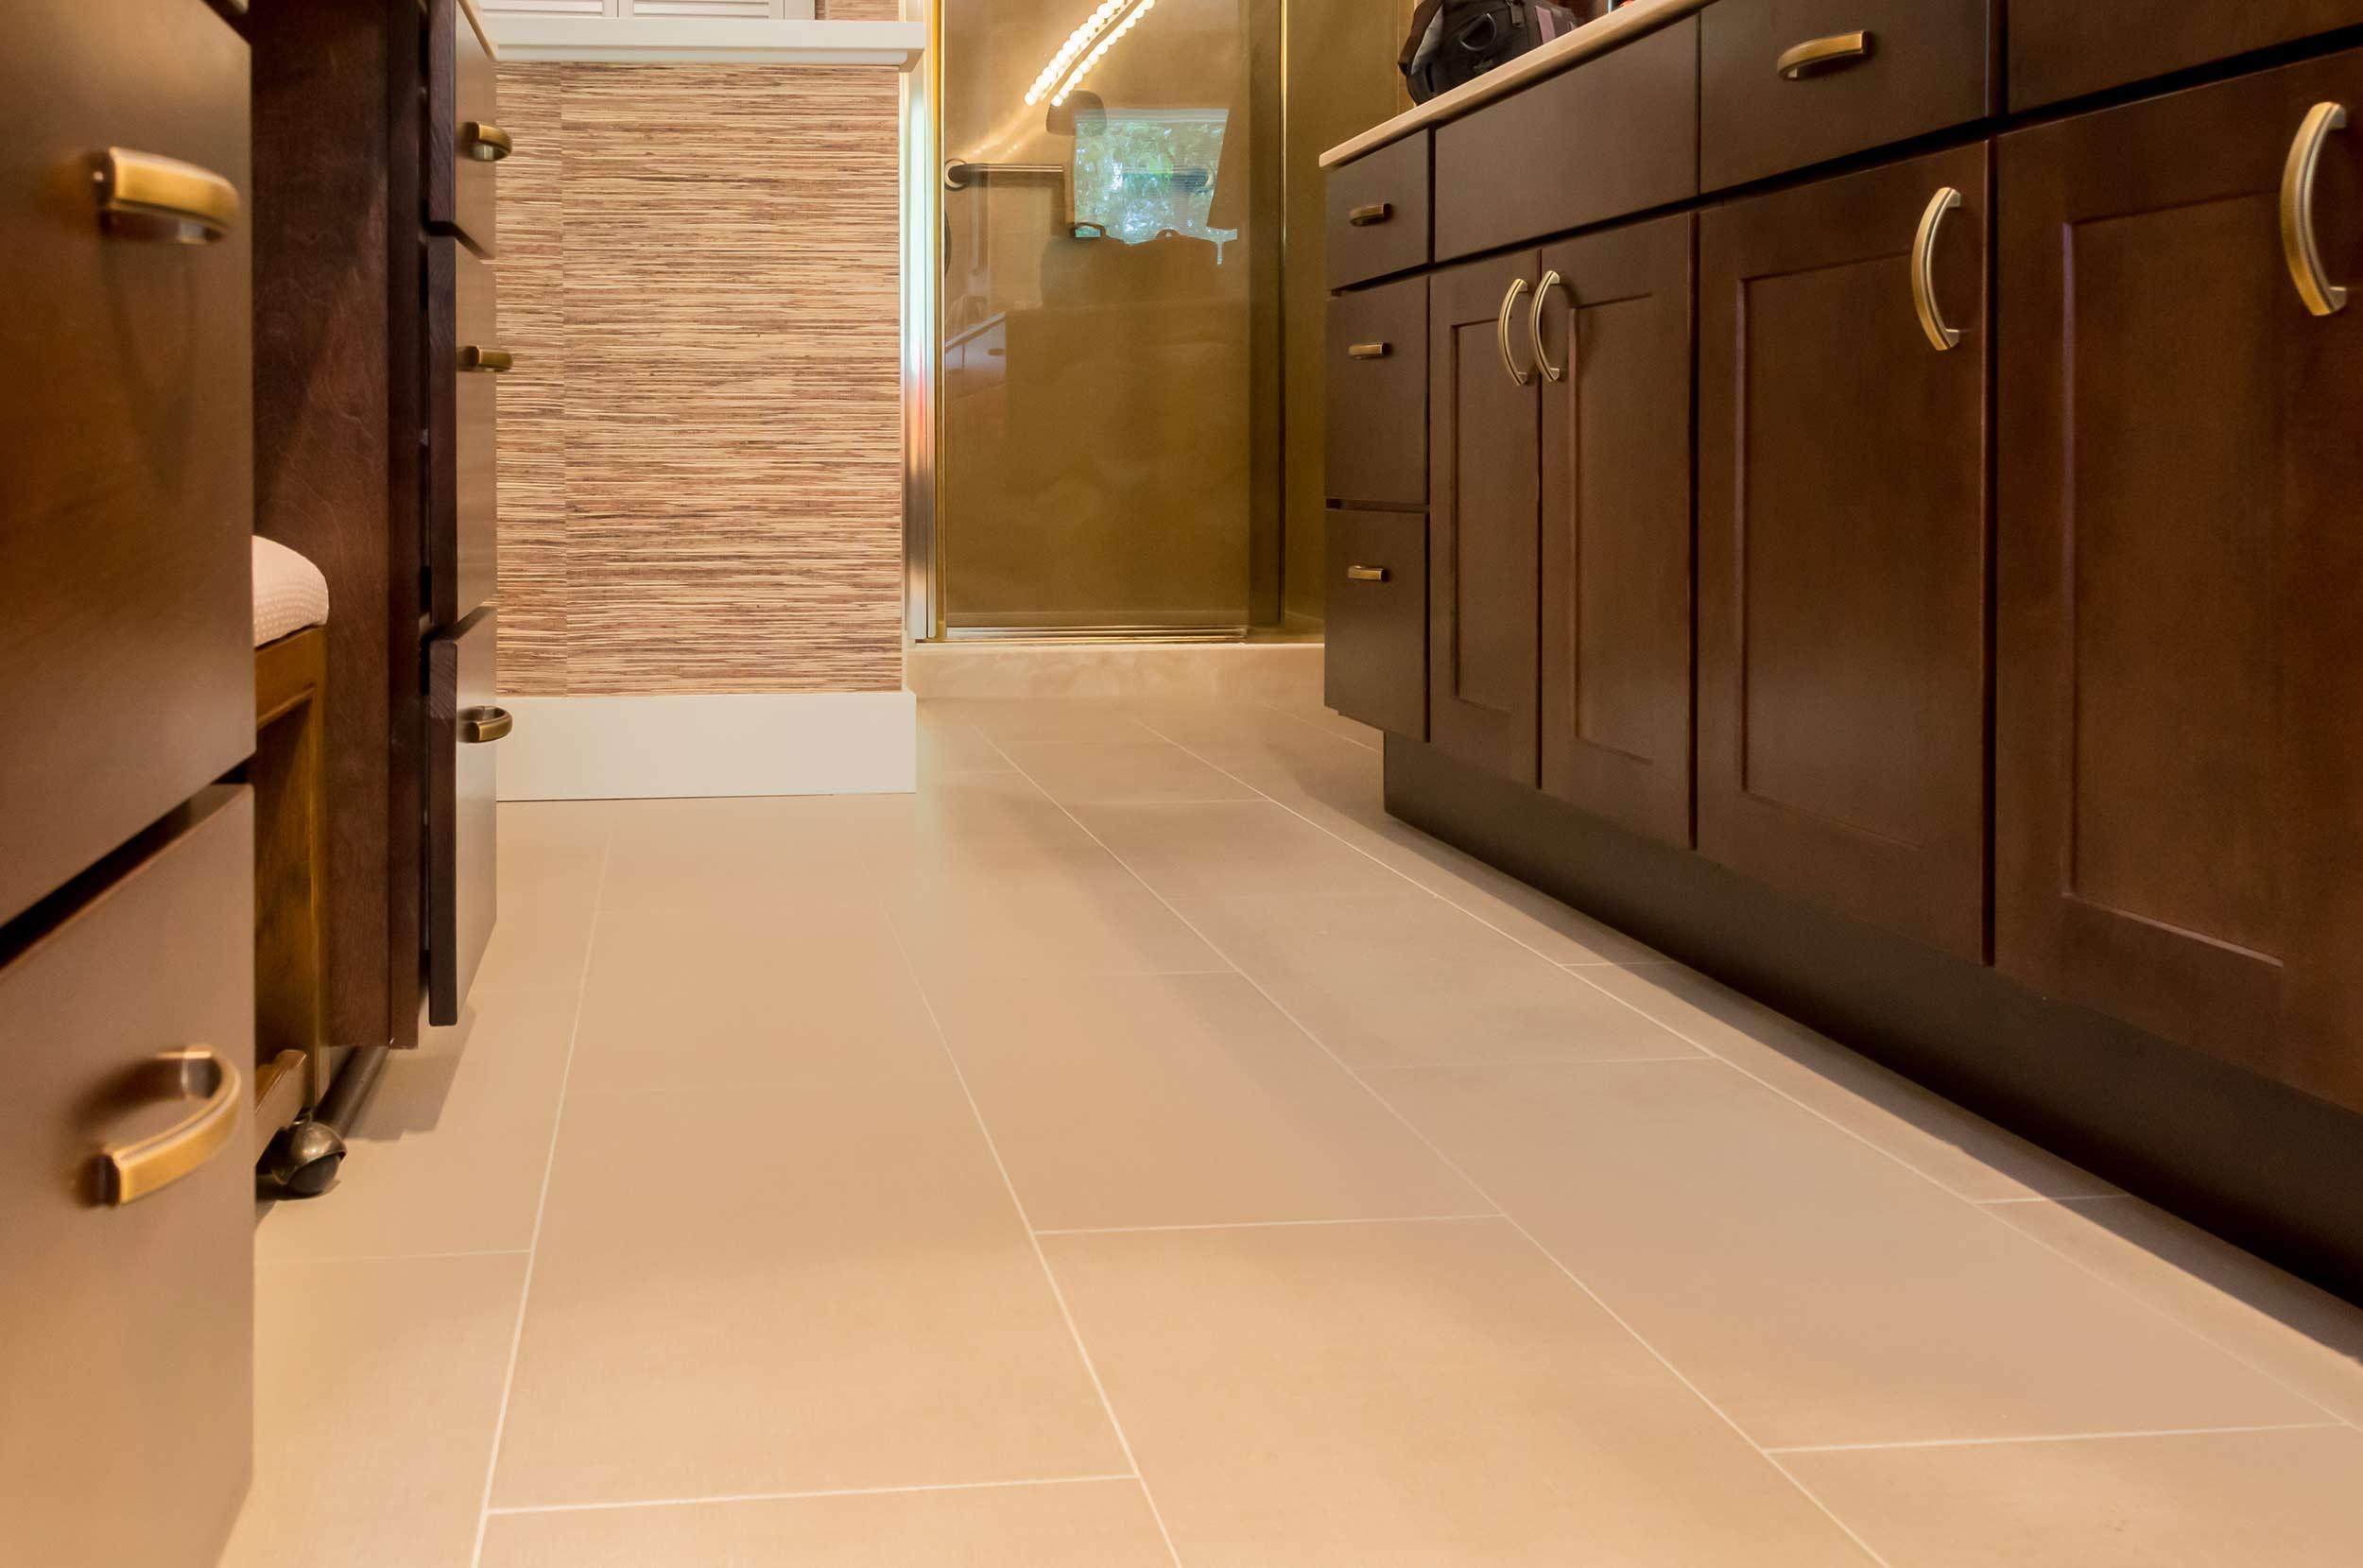 wnc flooring homesource design center